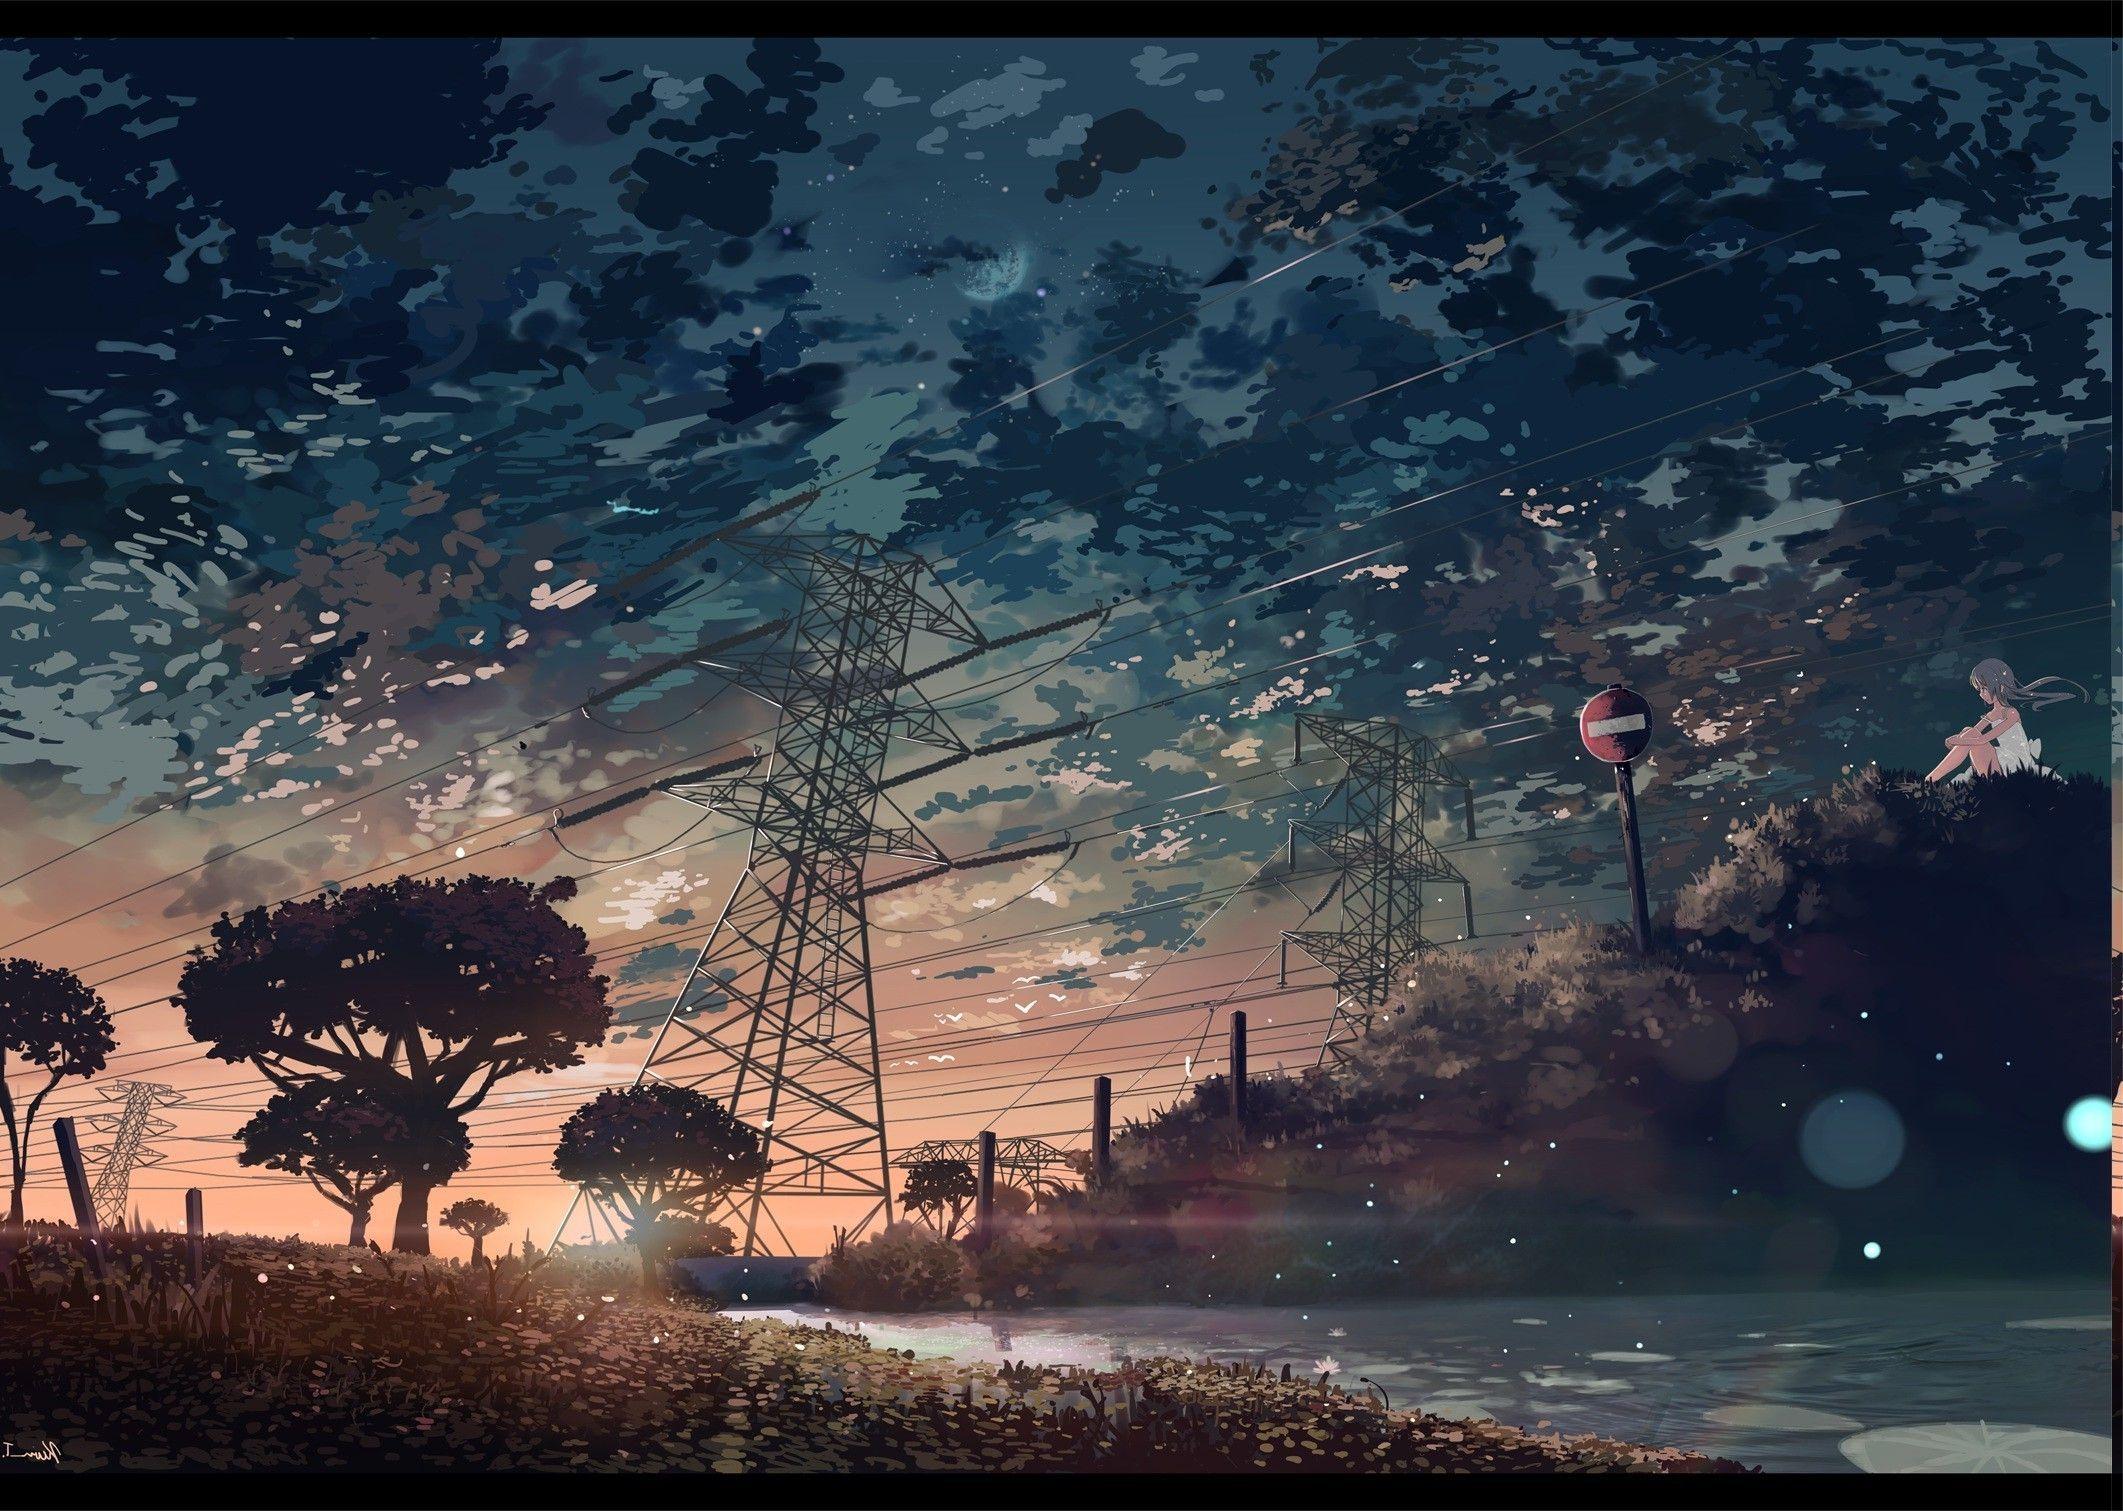 2123x1511 Anime Nature Wallpaper 77 Images Landscape Wallpaper Scenery Wallpaper Anime Backgrounds Wallpapers